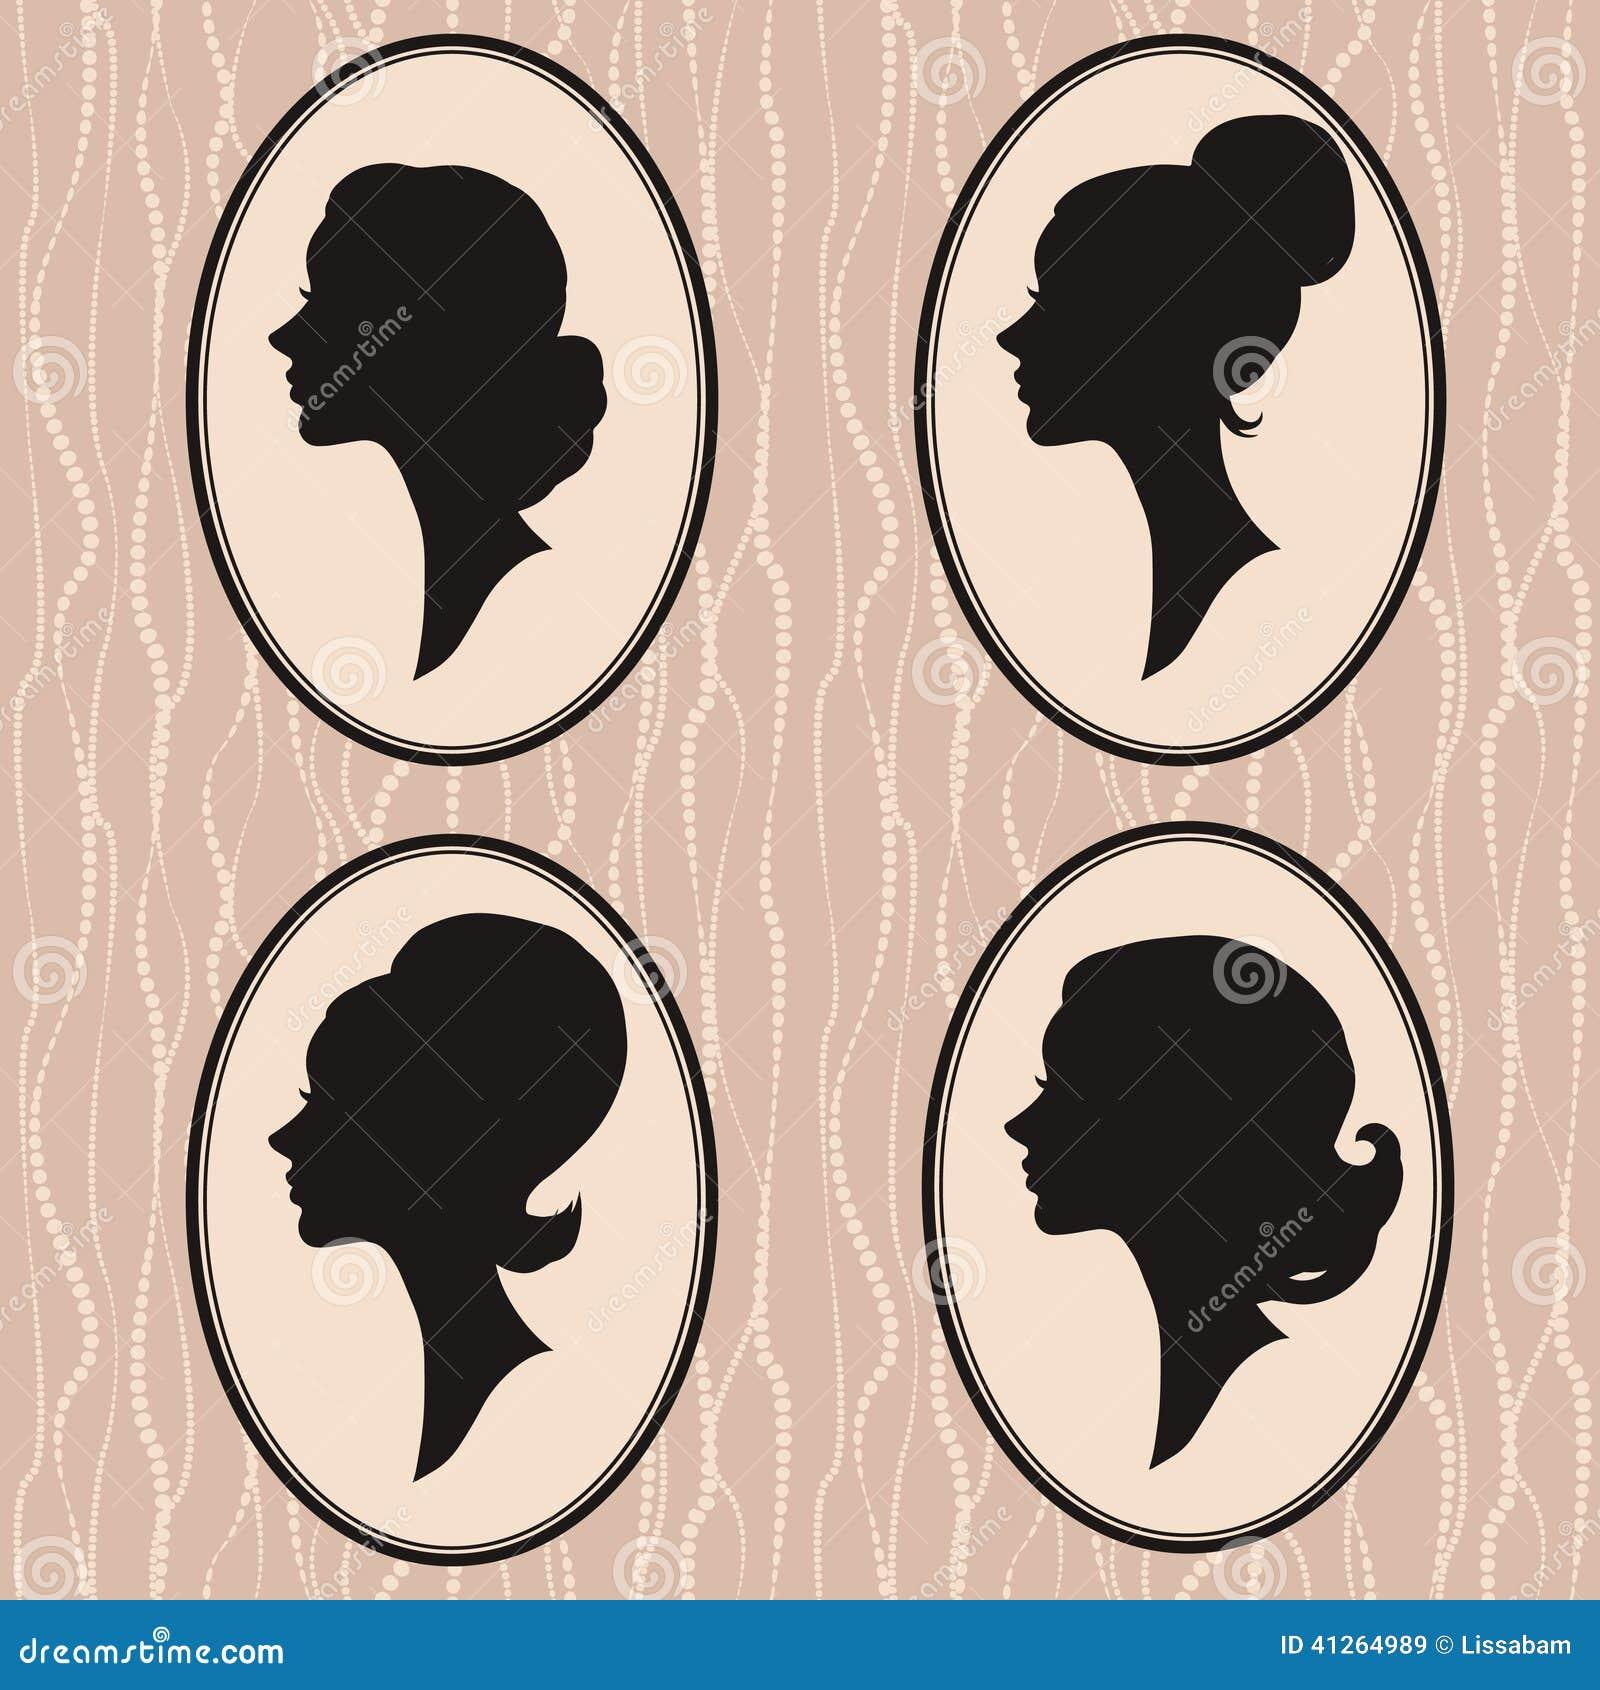 profile Vintage silhouette woman